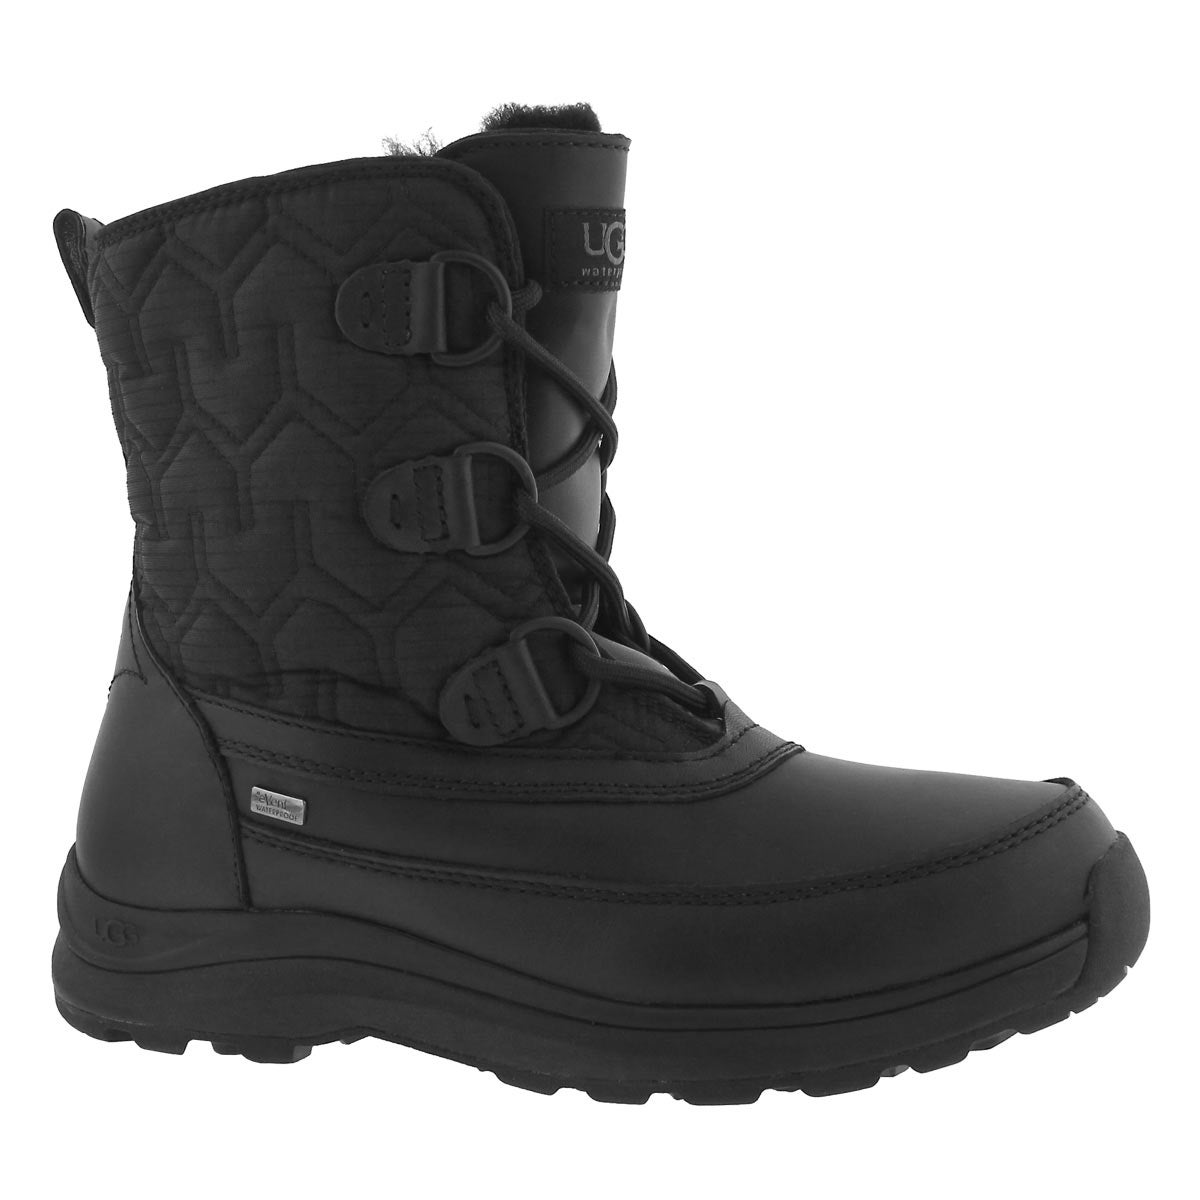 Lds Lachlan black wtpf winter boot